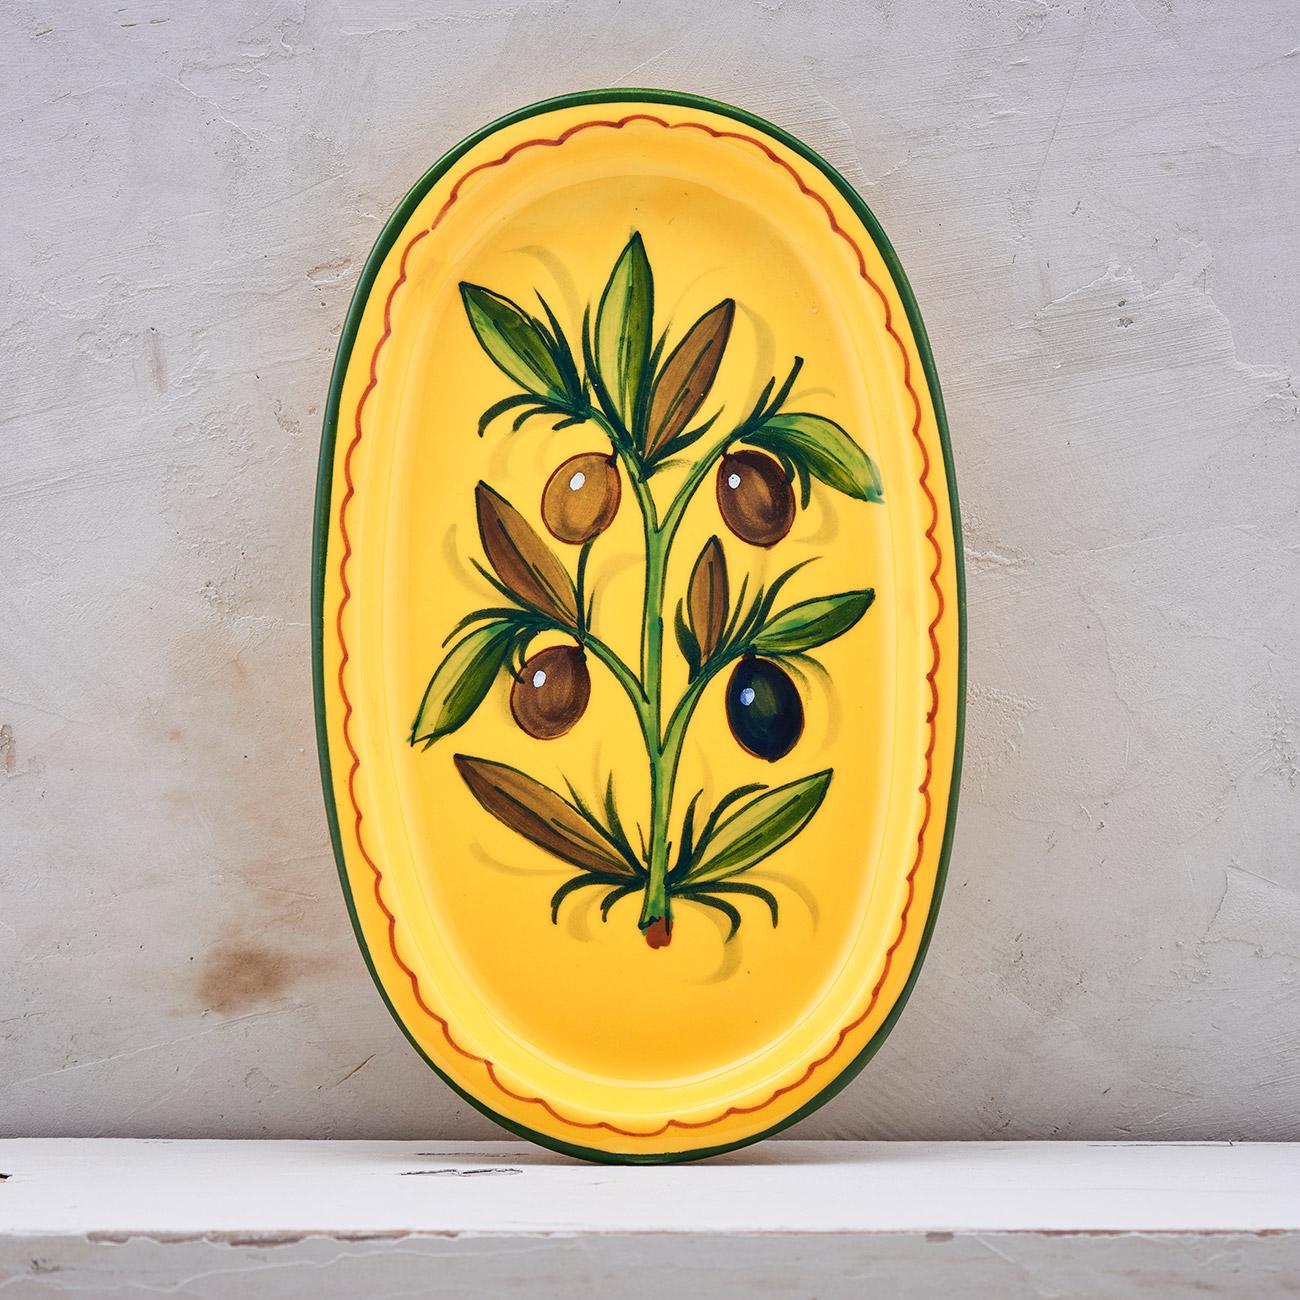 Yellow Olive Tree Tray - 22 x 13 cm